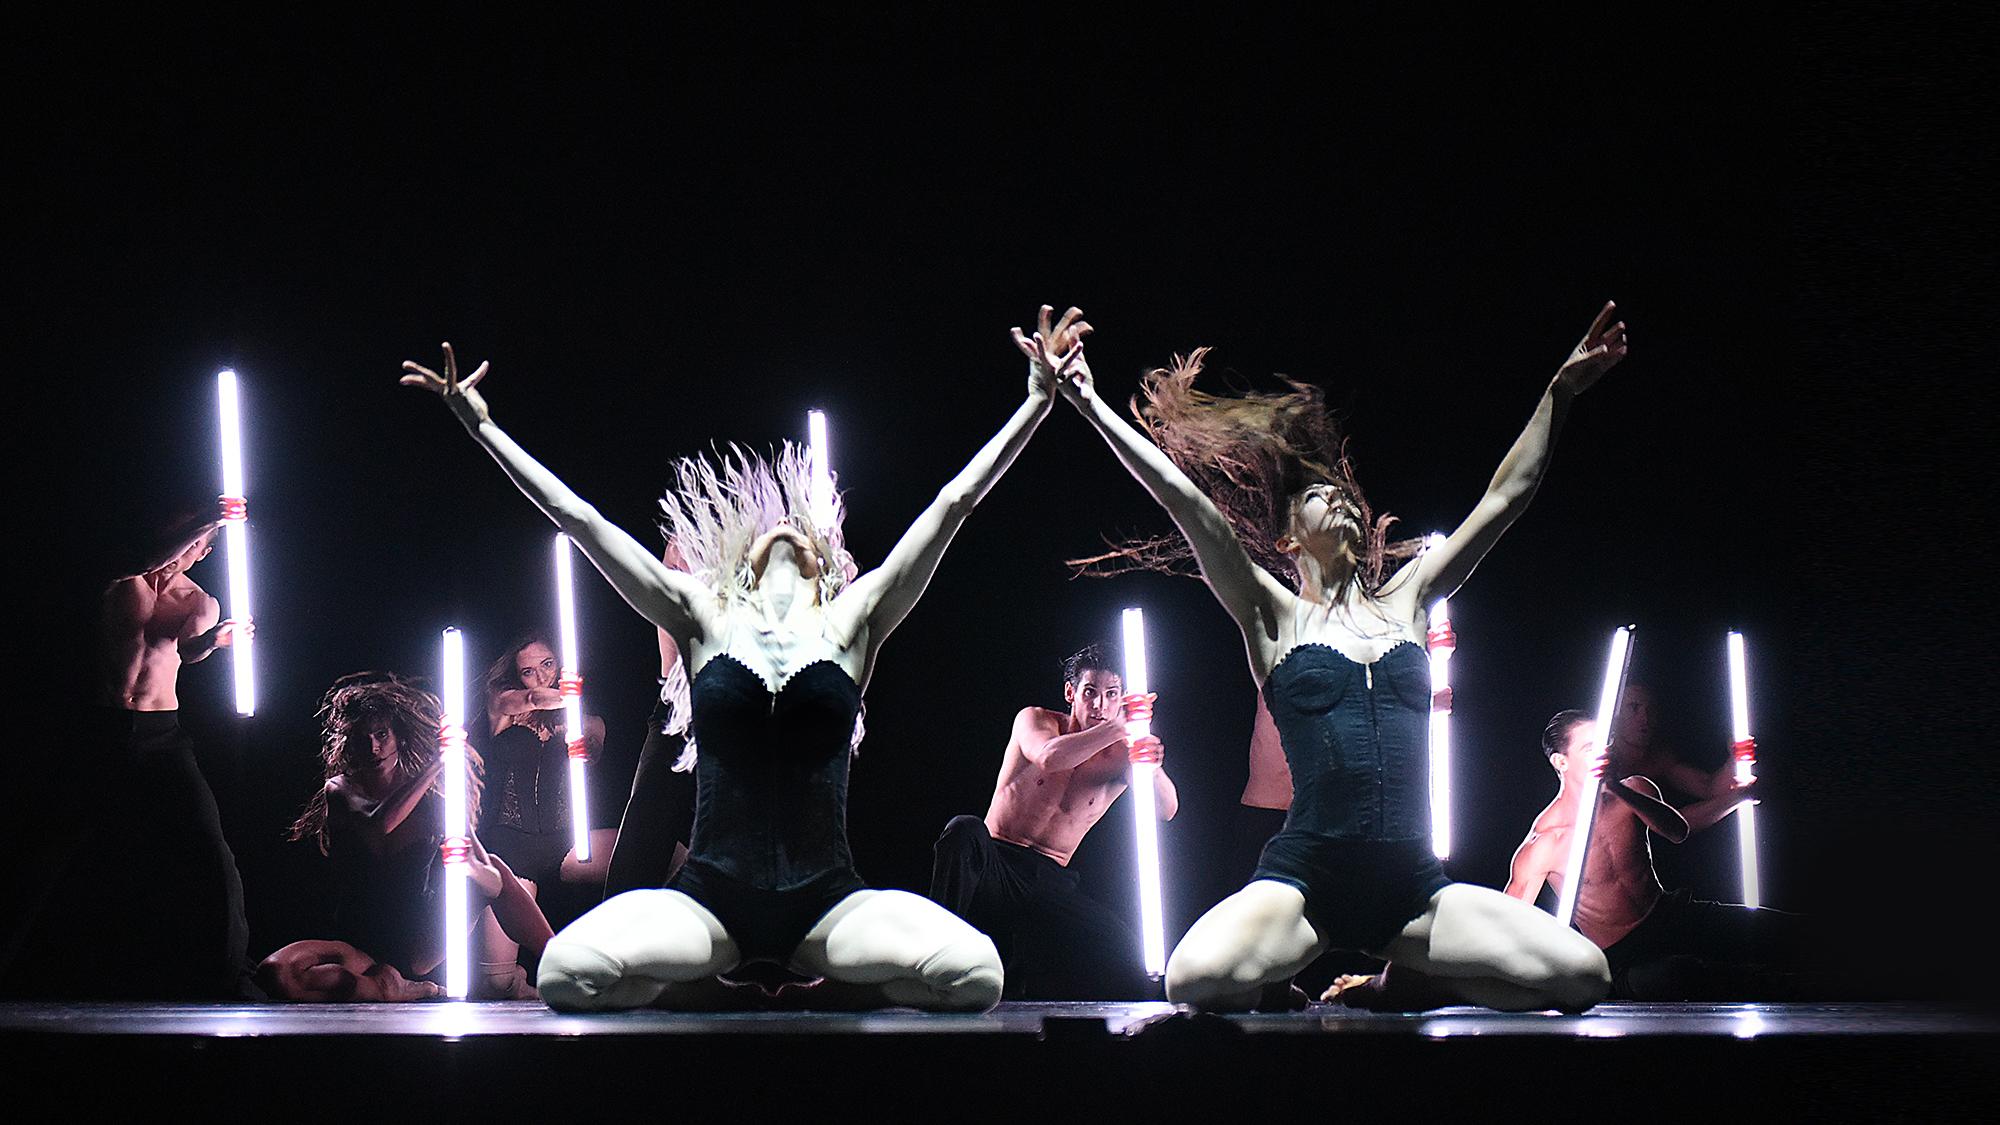 Electric Life - Gauthier Dance // Dance Company Theaterhaus Stuttgart / Eric Gauthier + Andonis Foniadakis